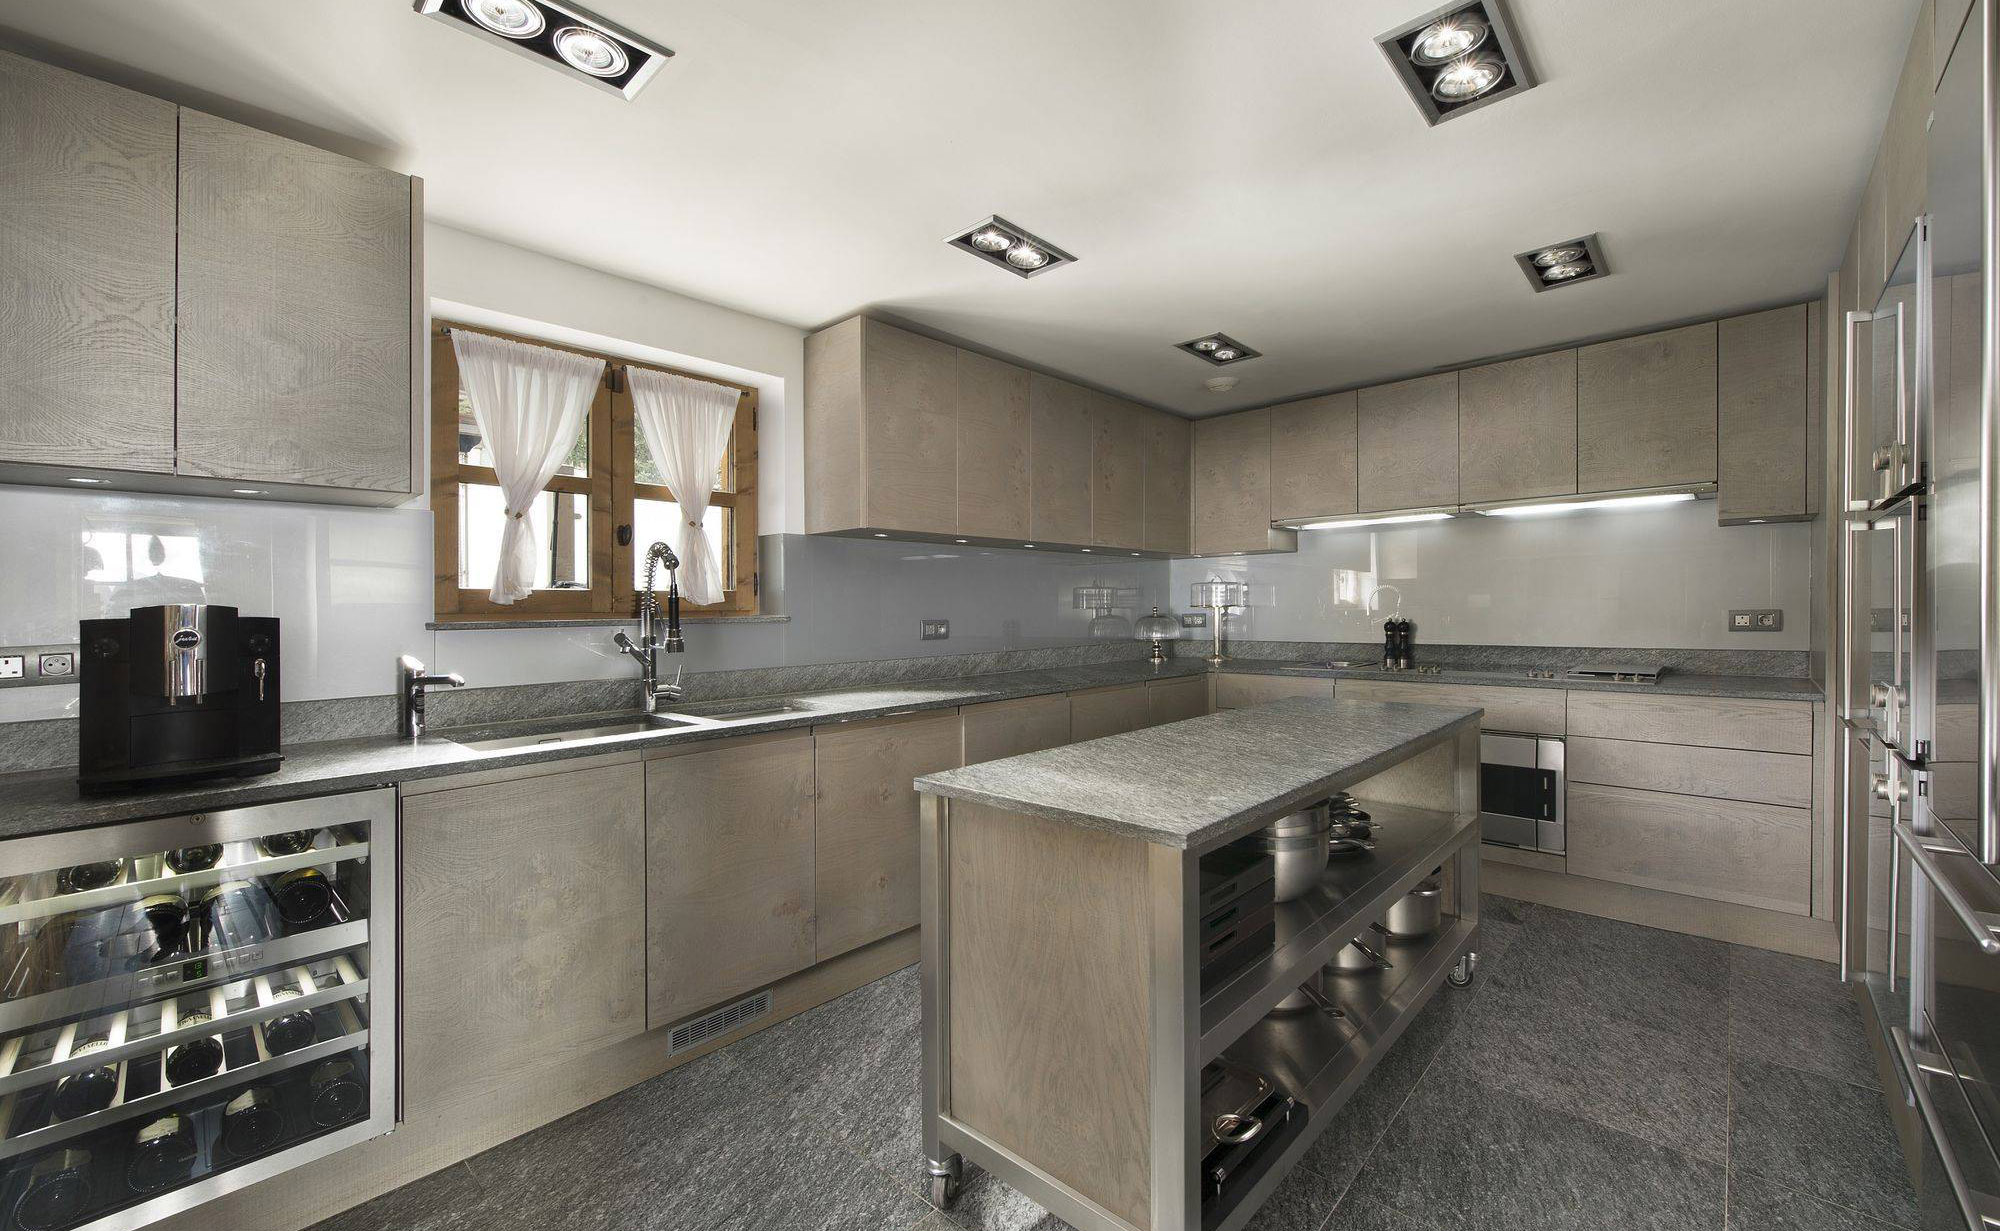 Lovelydays luxury service apartment rental - Courchevel - Great Roc Chalet - Partner - 7 bedrooms - 6 bathrooms - Modern kitchen - ea8b197a67e9 - Lovelydays